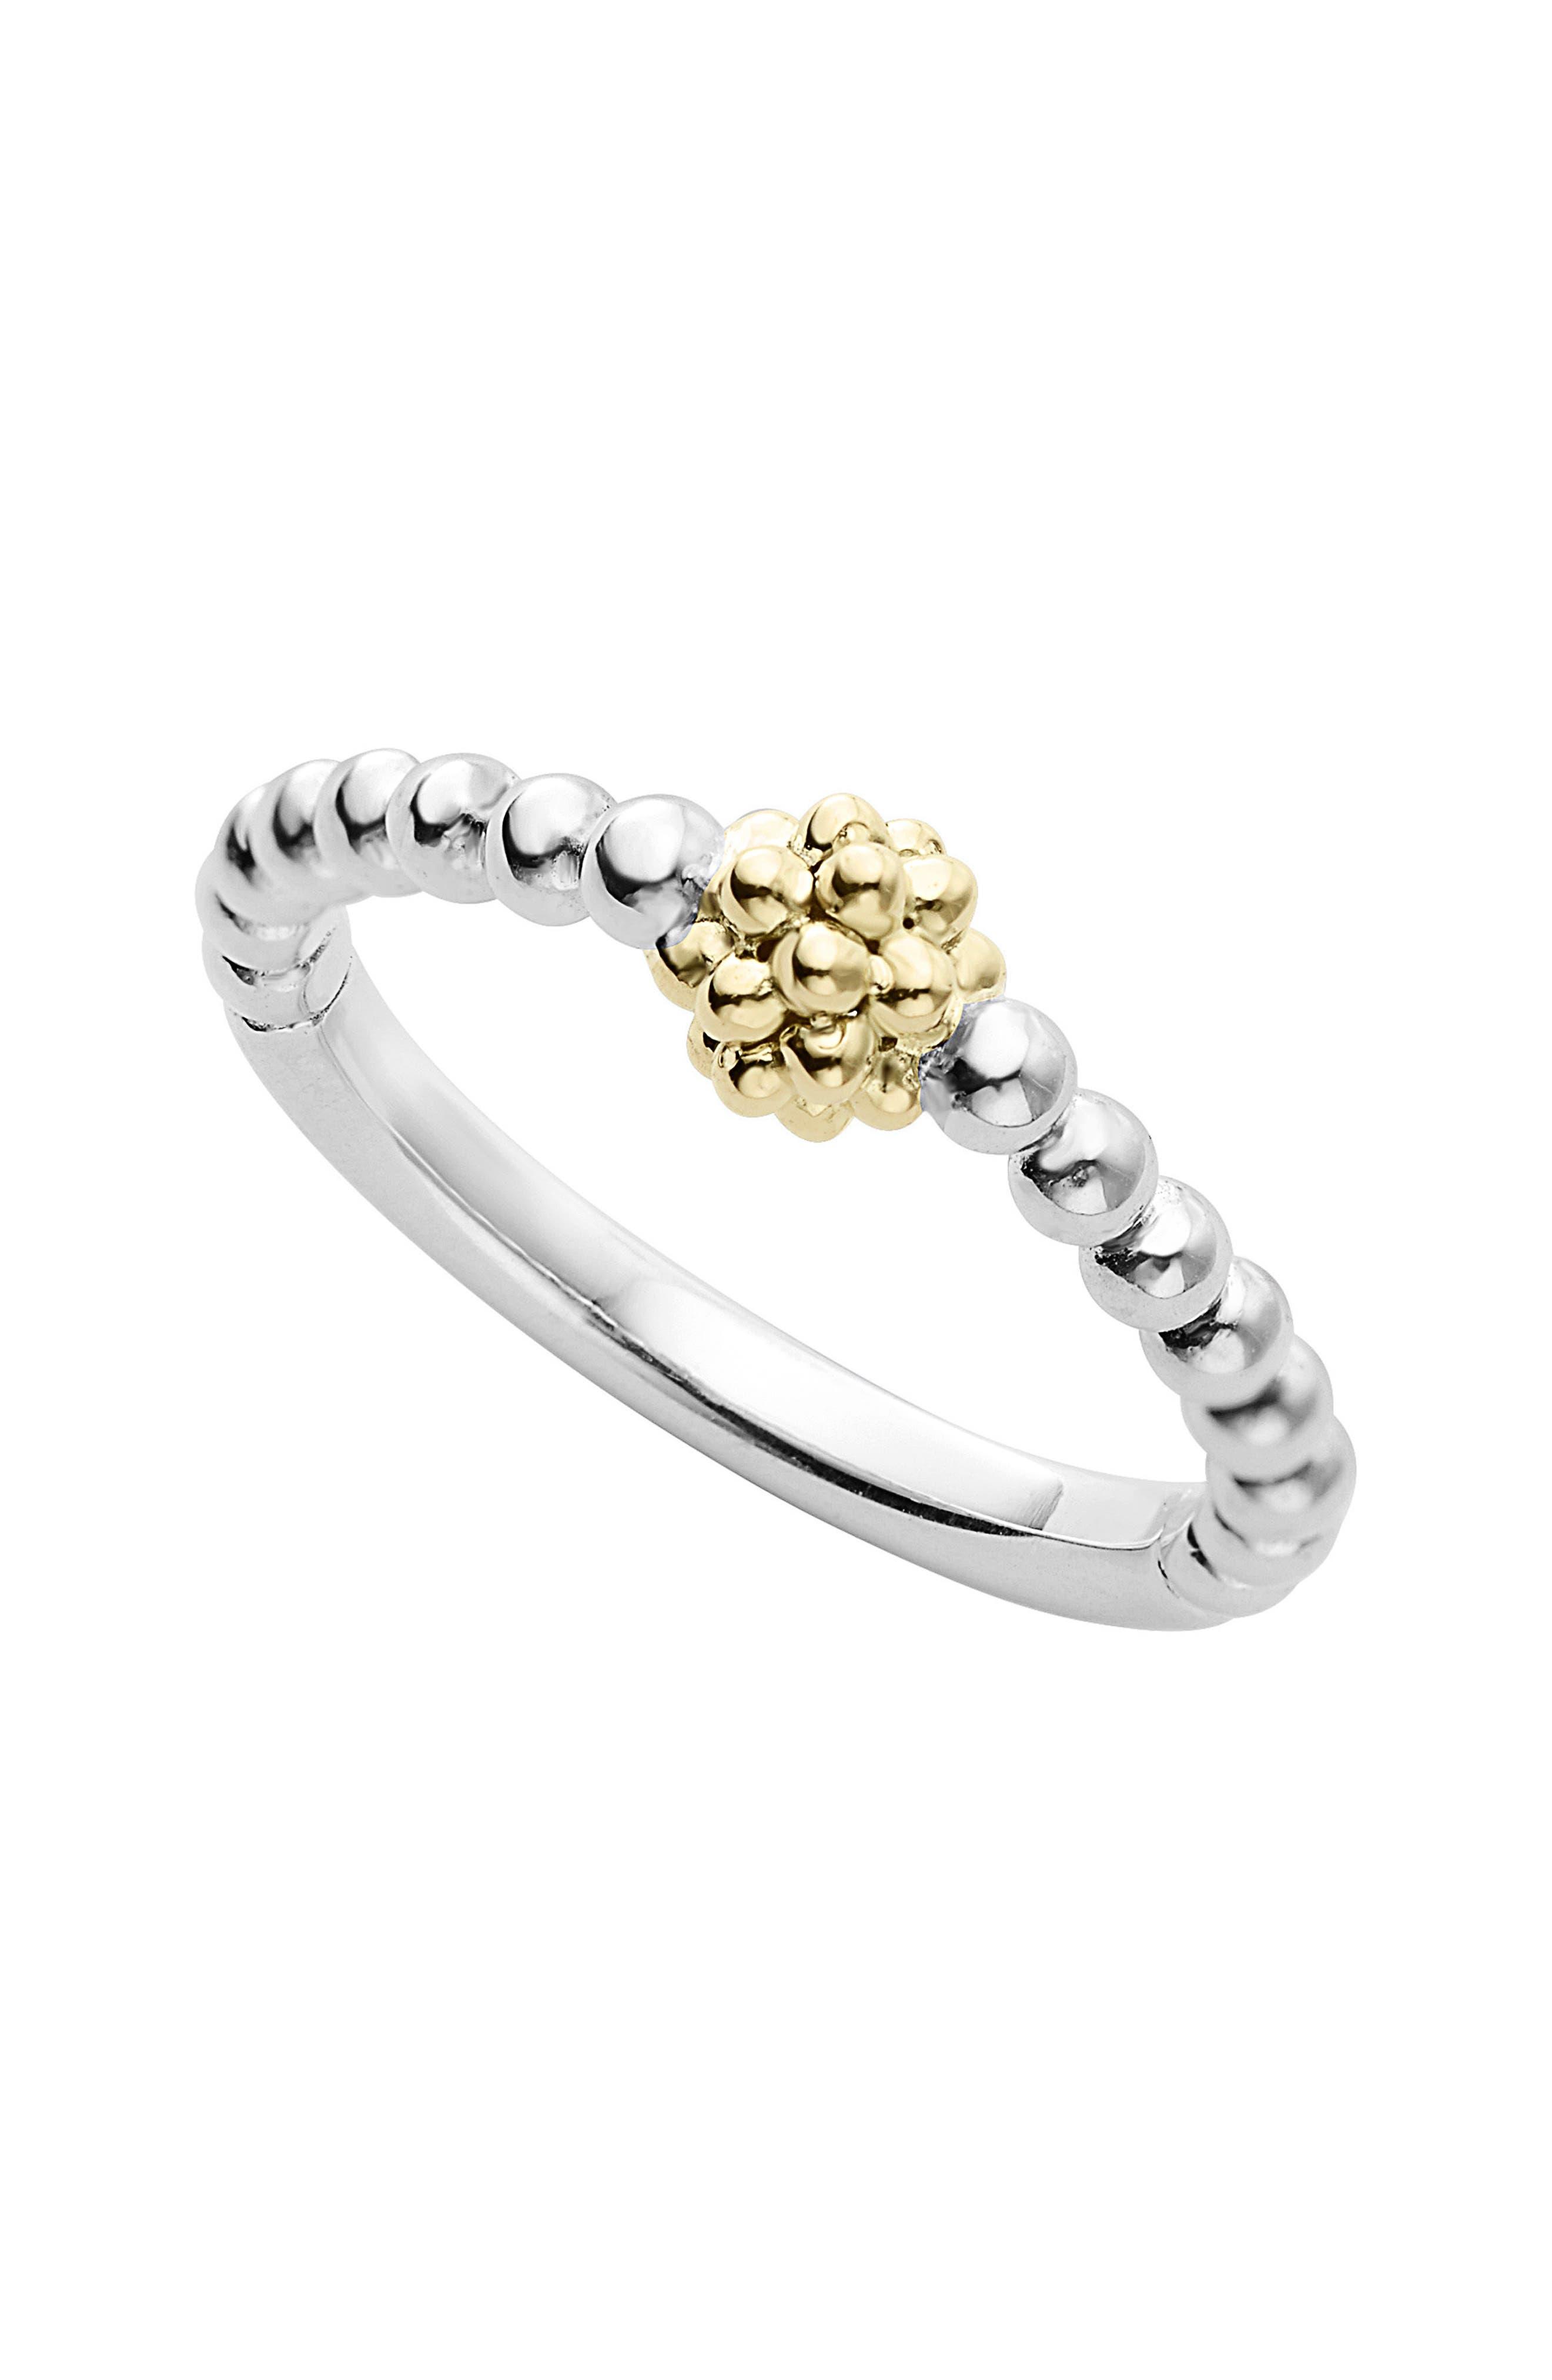 Caviar Icon Stacking Ring,                             Main thumbnail 1, color,                             Silver/ Gold